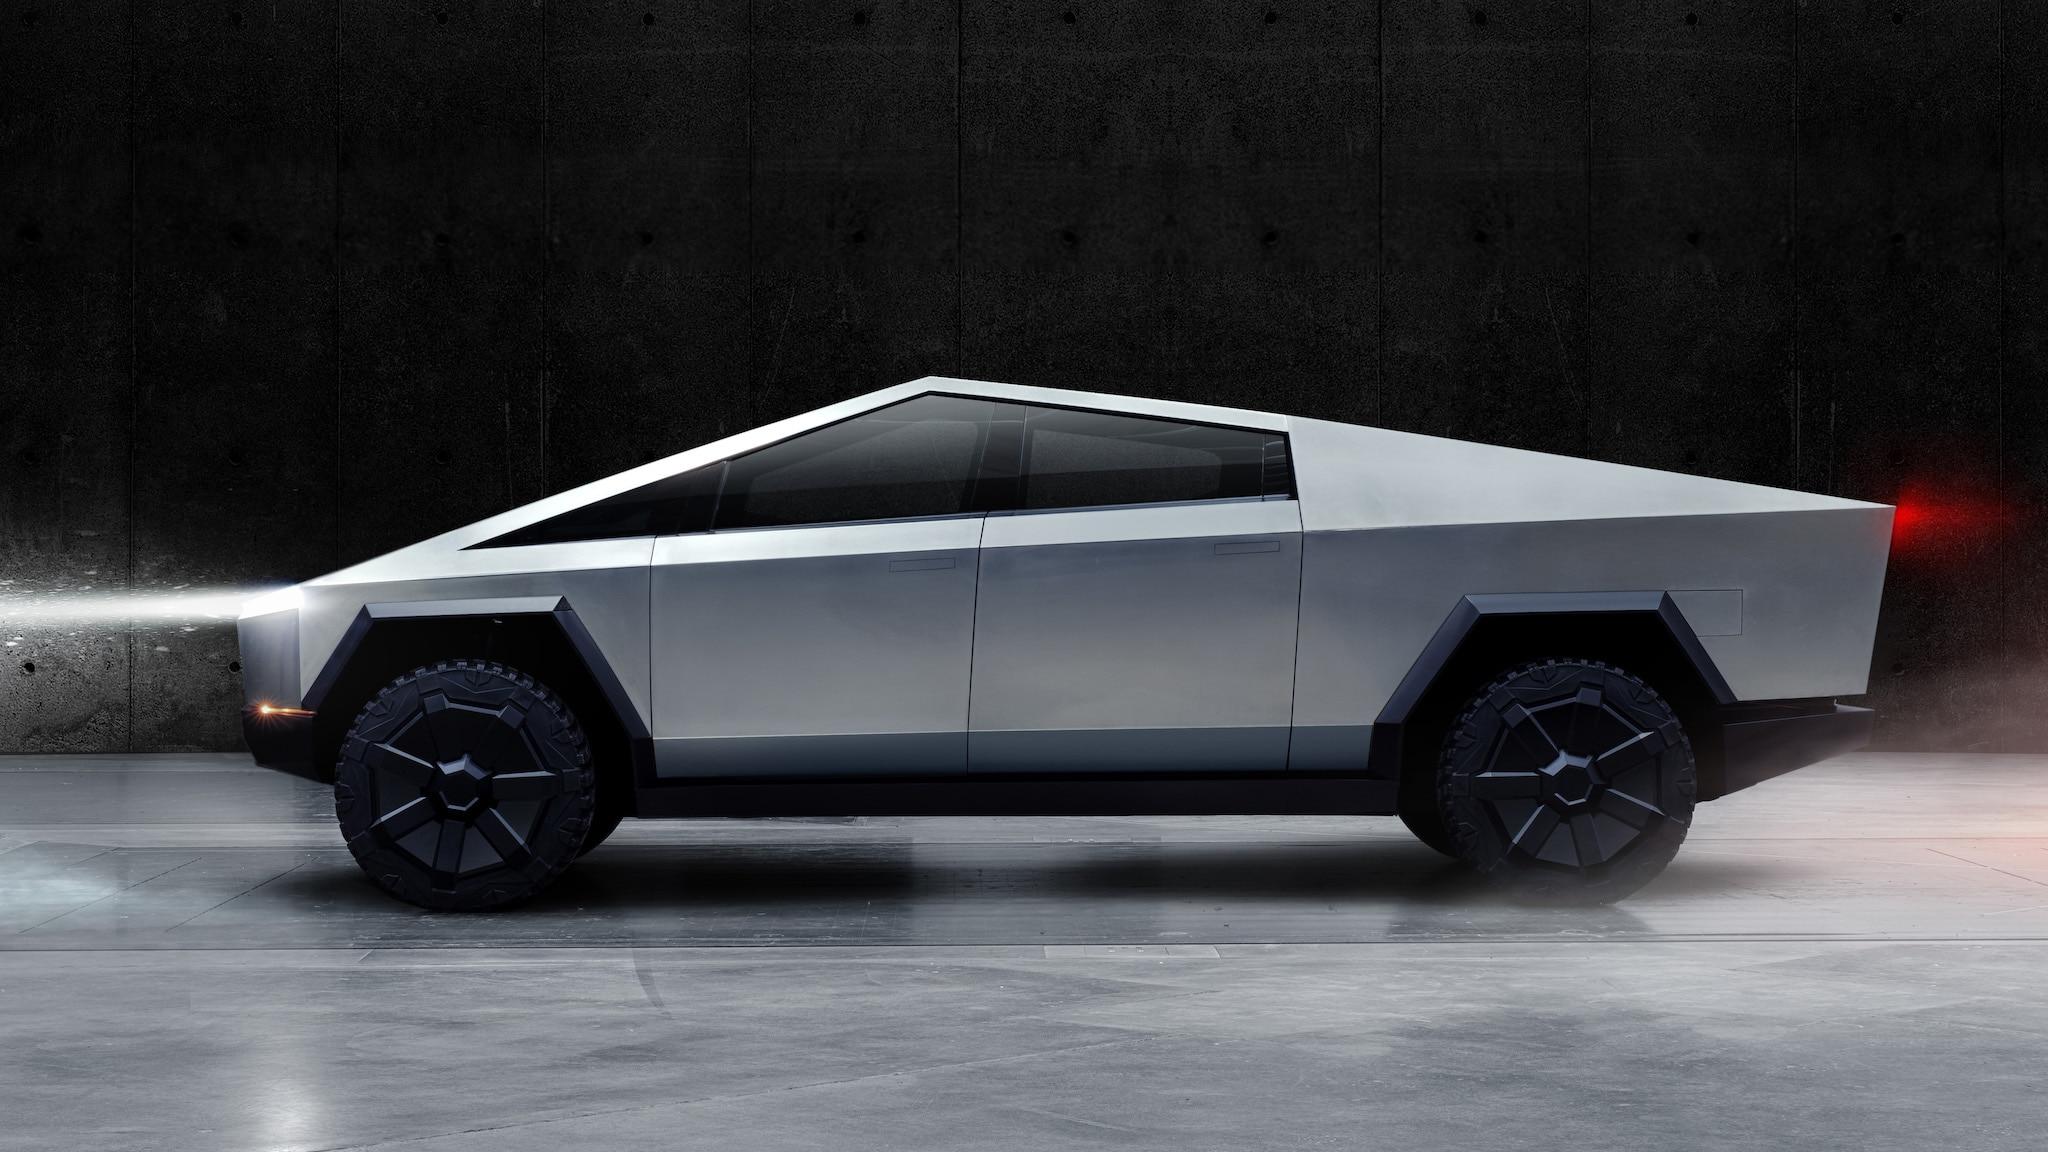 Ram Ecodiesel Review >> Tesla Cybertruck: Range, Power, Payload, Towing, Price ...